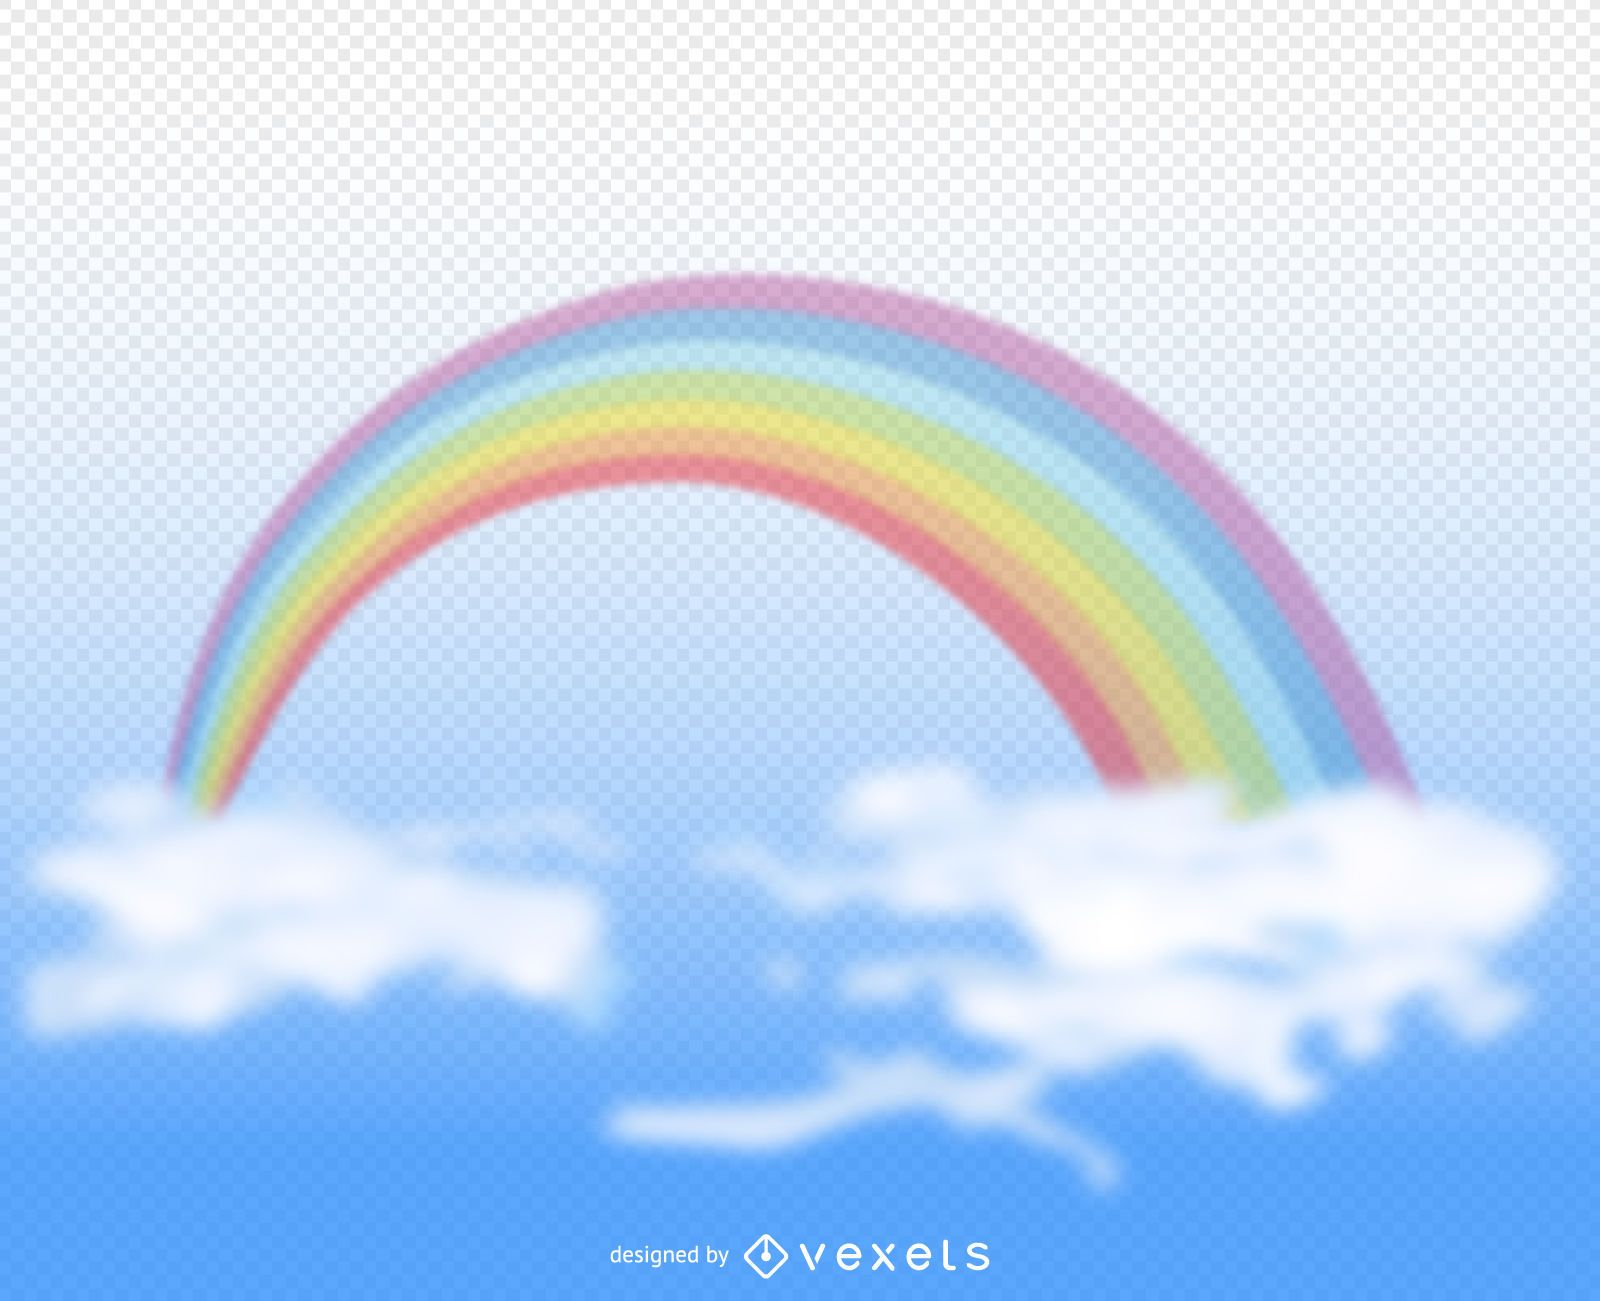 Transparent rainbow illustration